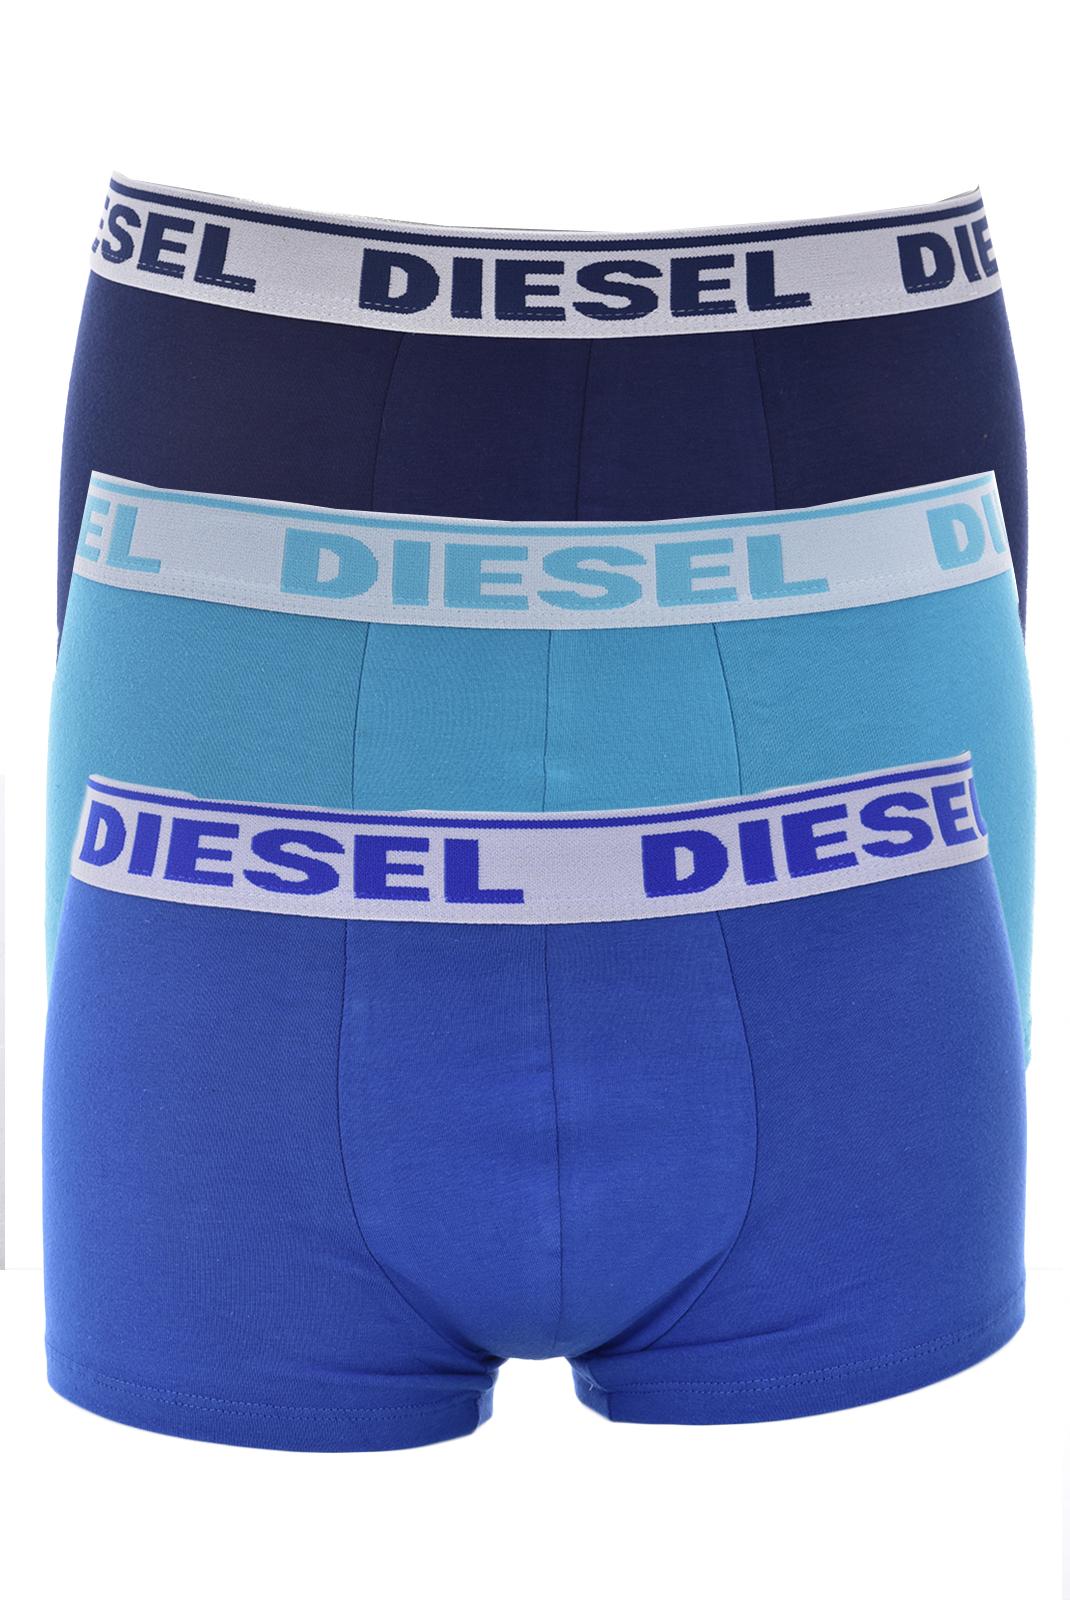 Slips-Caleçons  Diesel SHAWN 0GAFN BLEU/CIEL/ROYAL